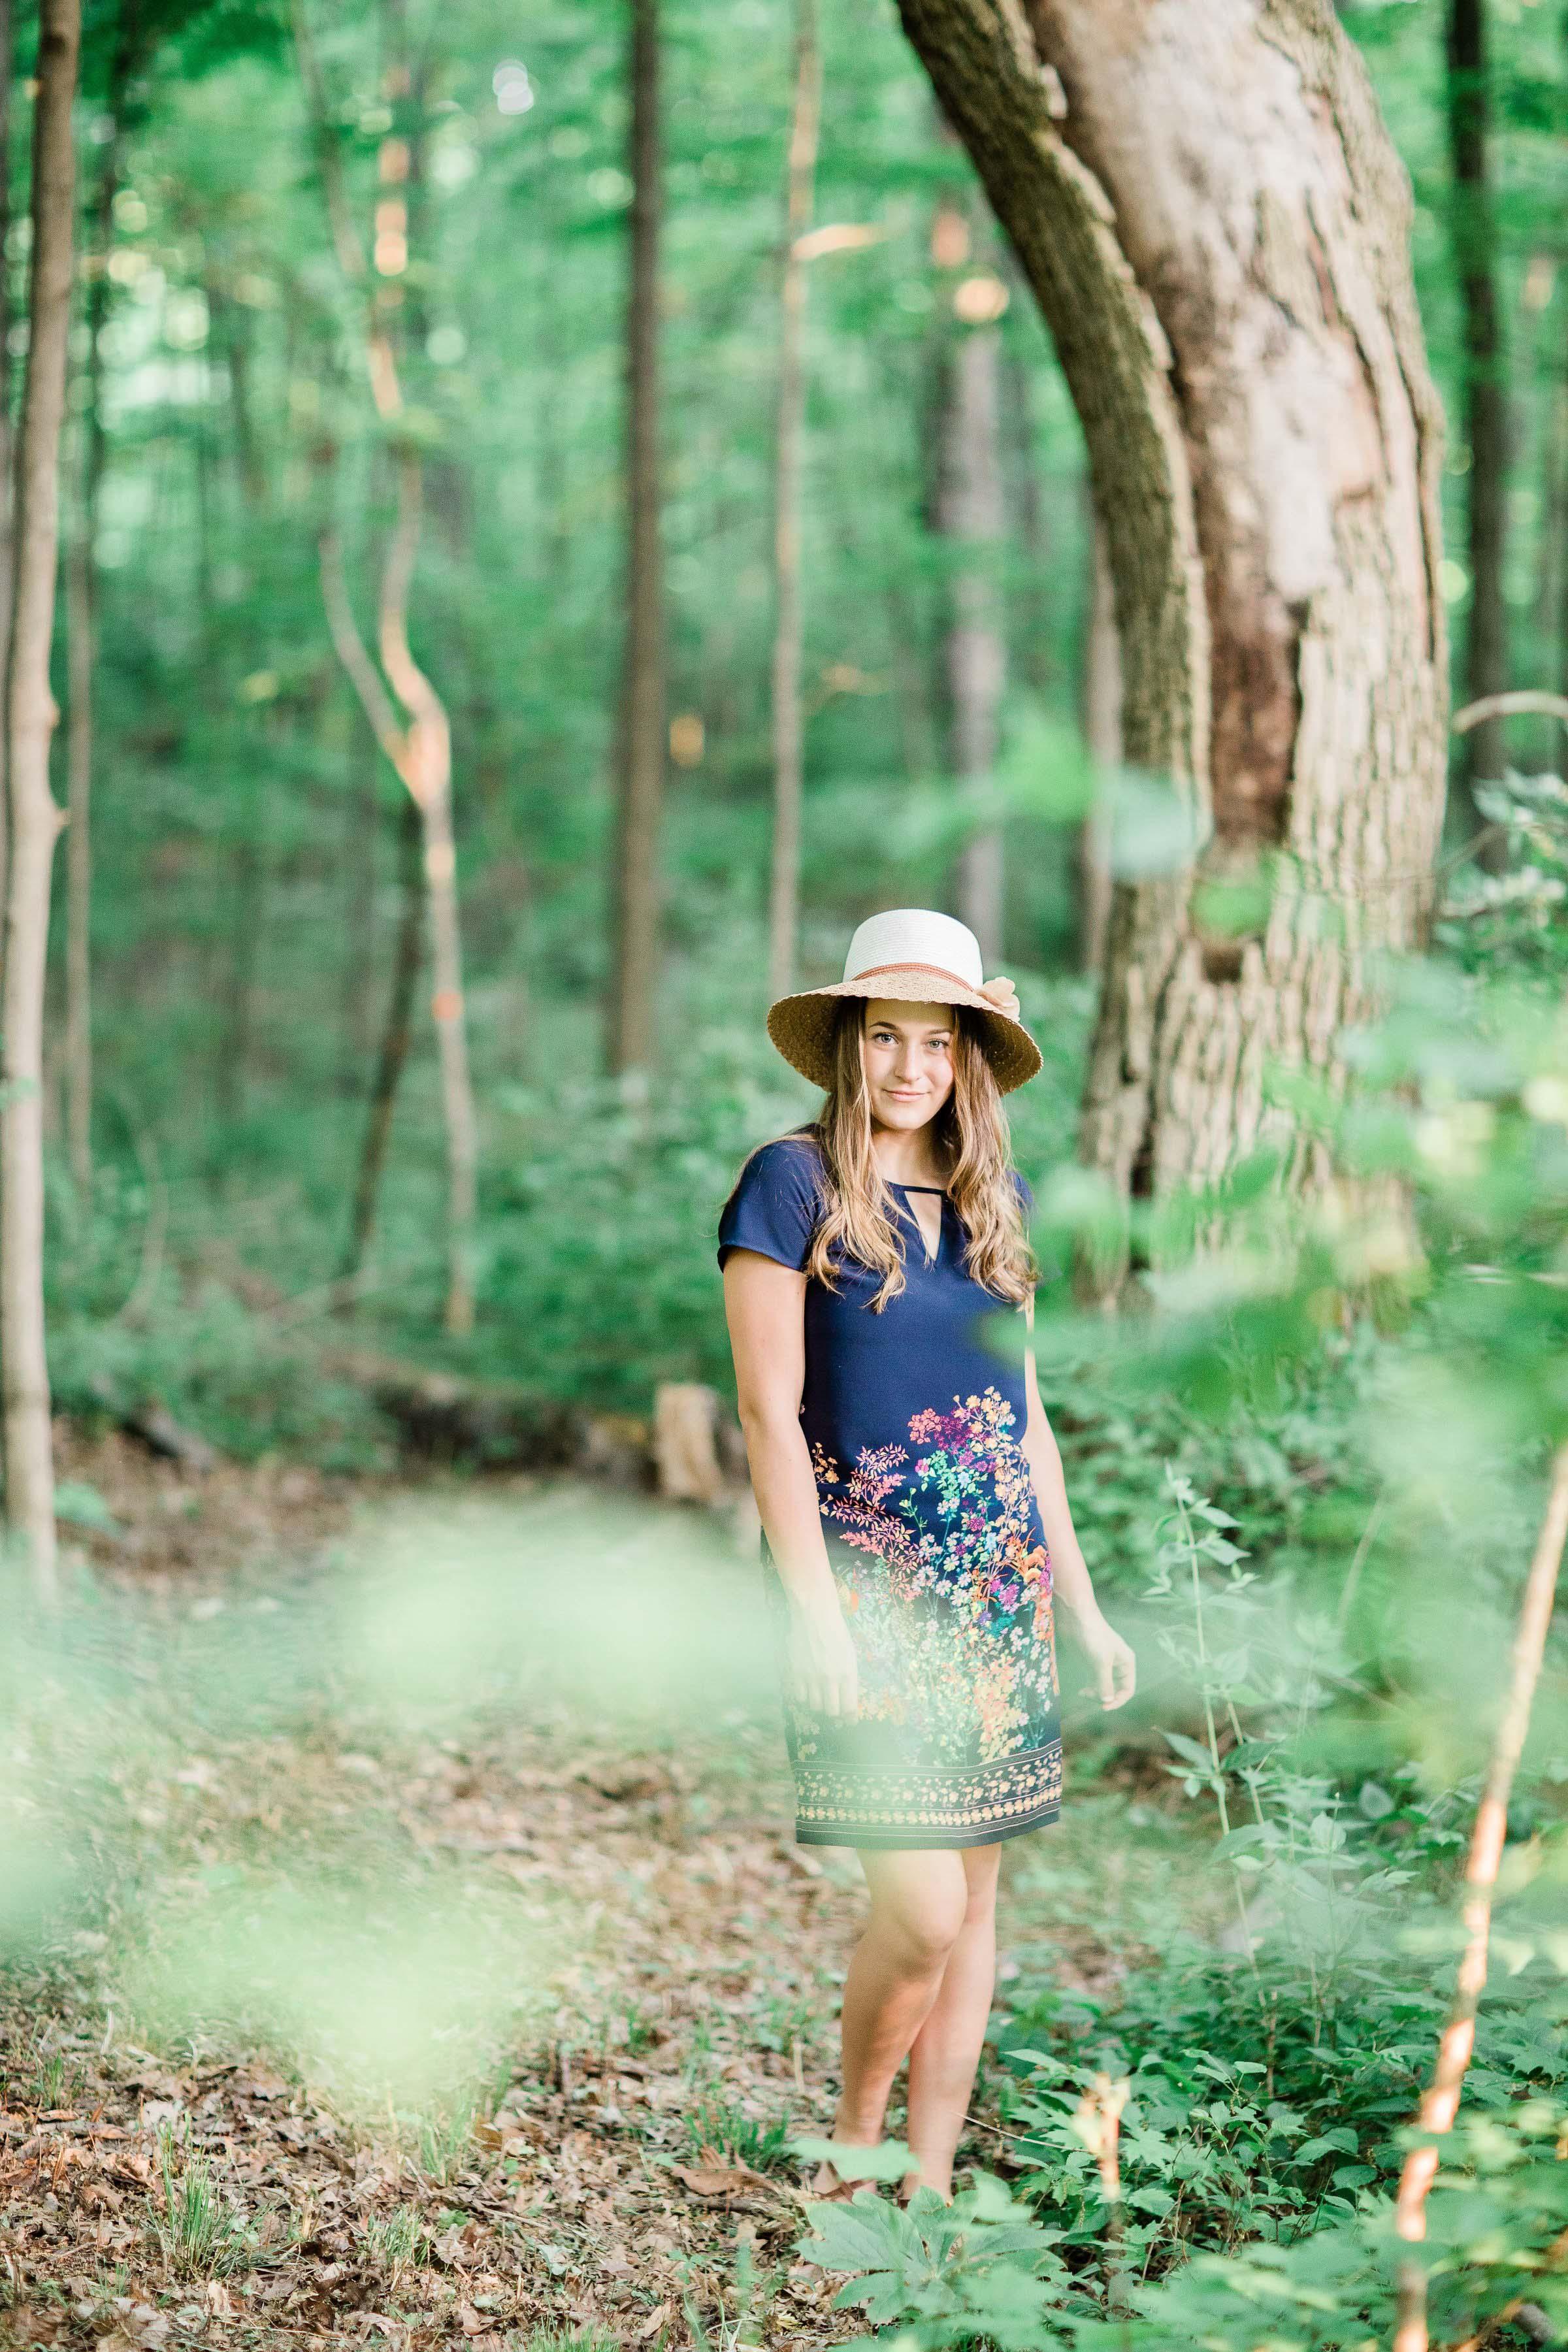 cincinnati dayton senior photographer cox arboretum session lauren day photography-10.jpg